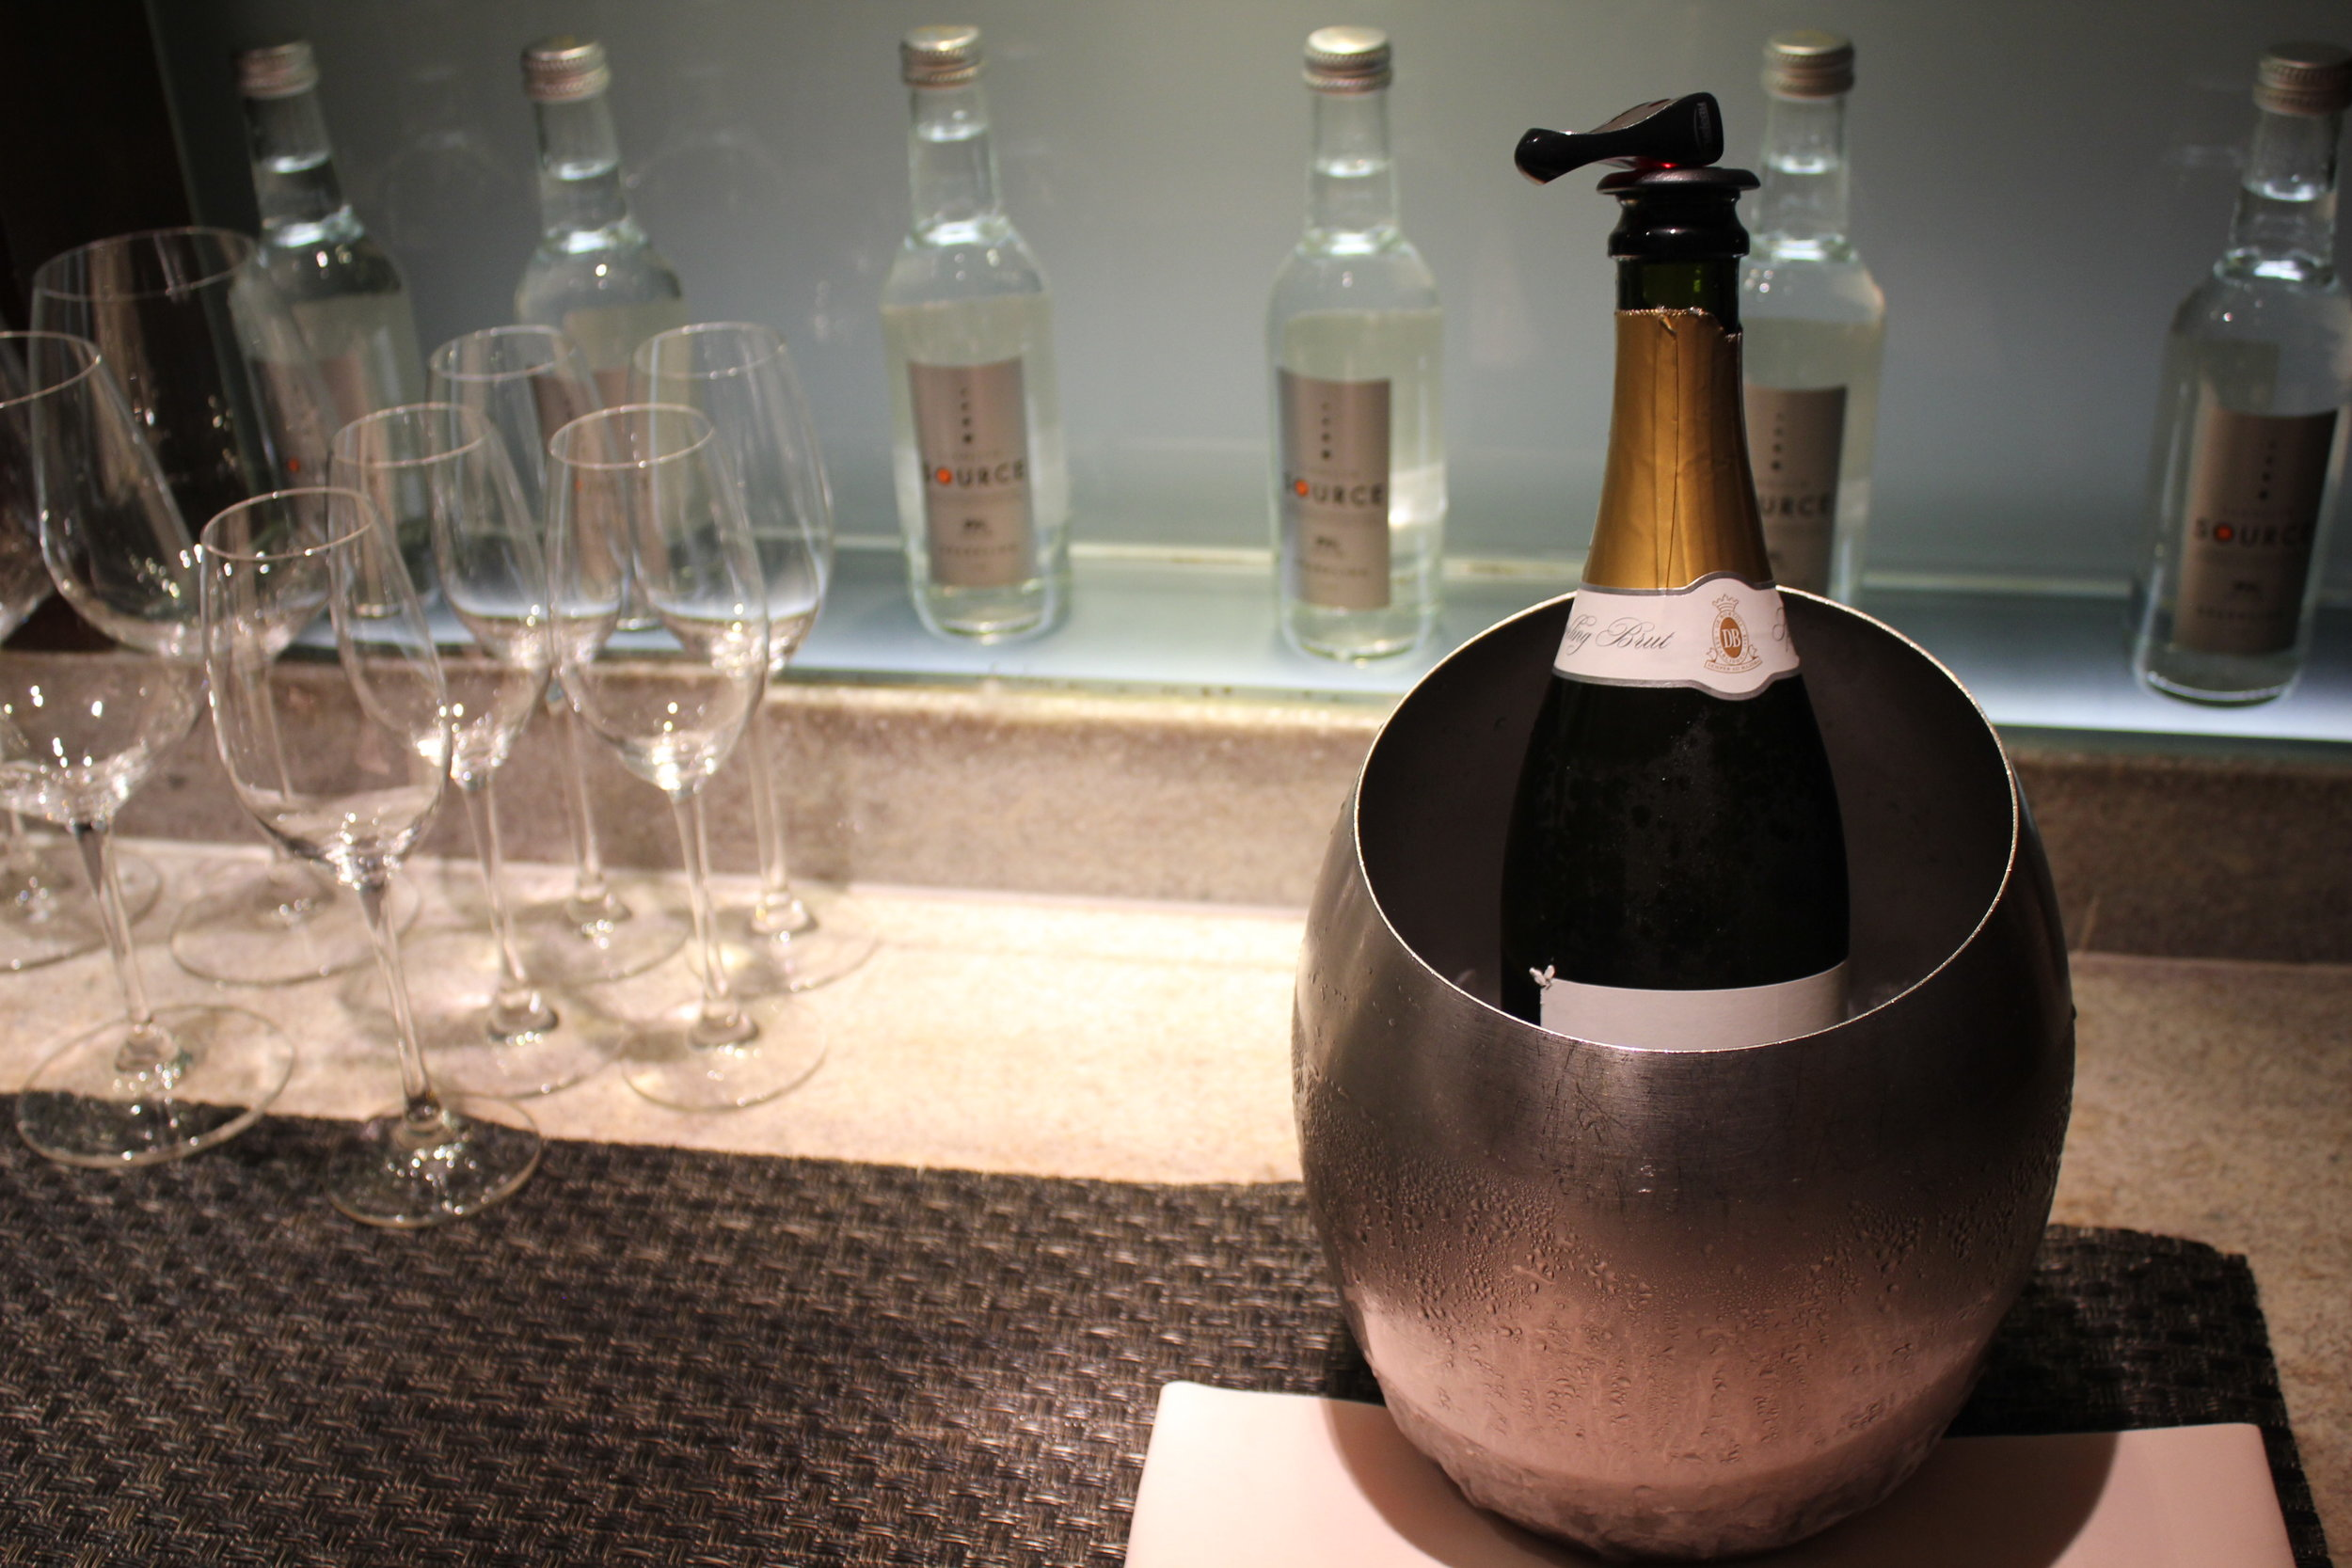 JW Marriott Hong Kong – Executive Lounge champagne